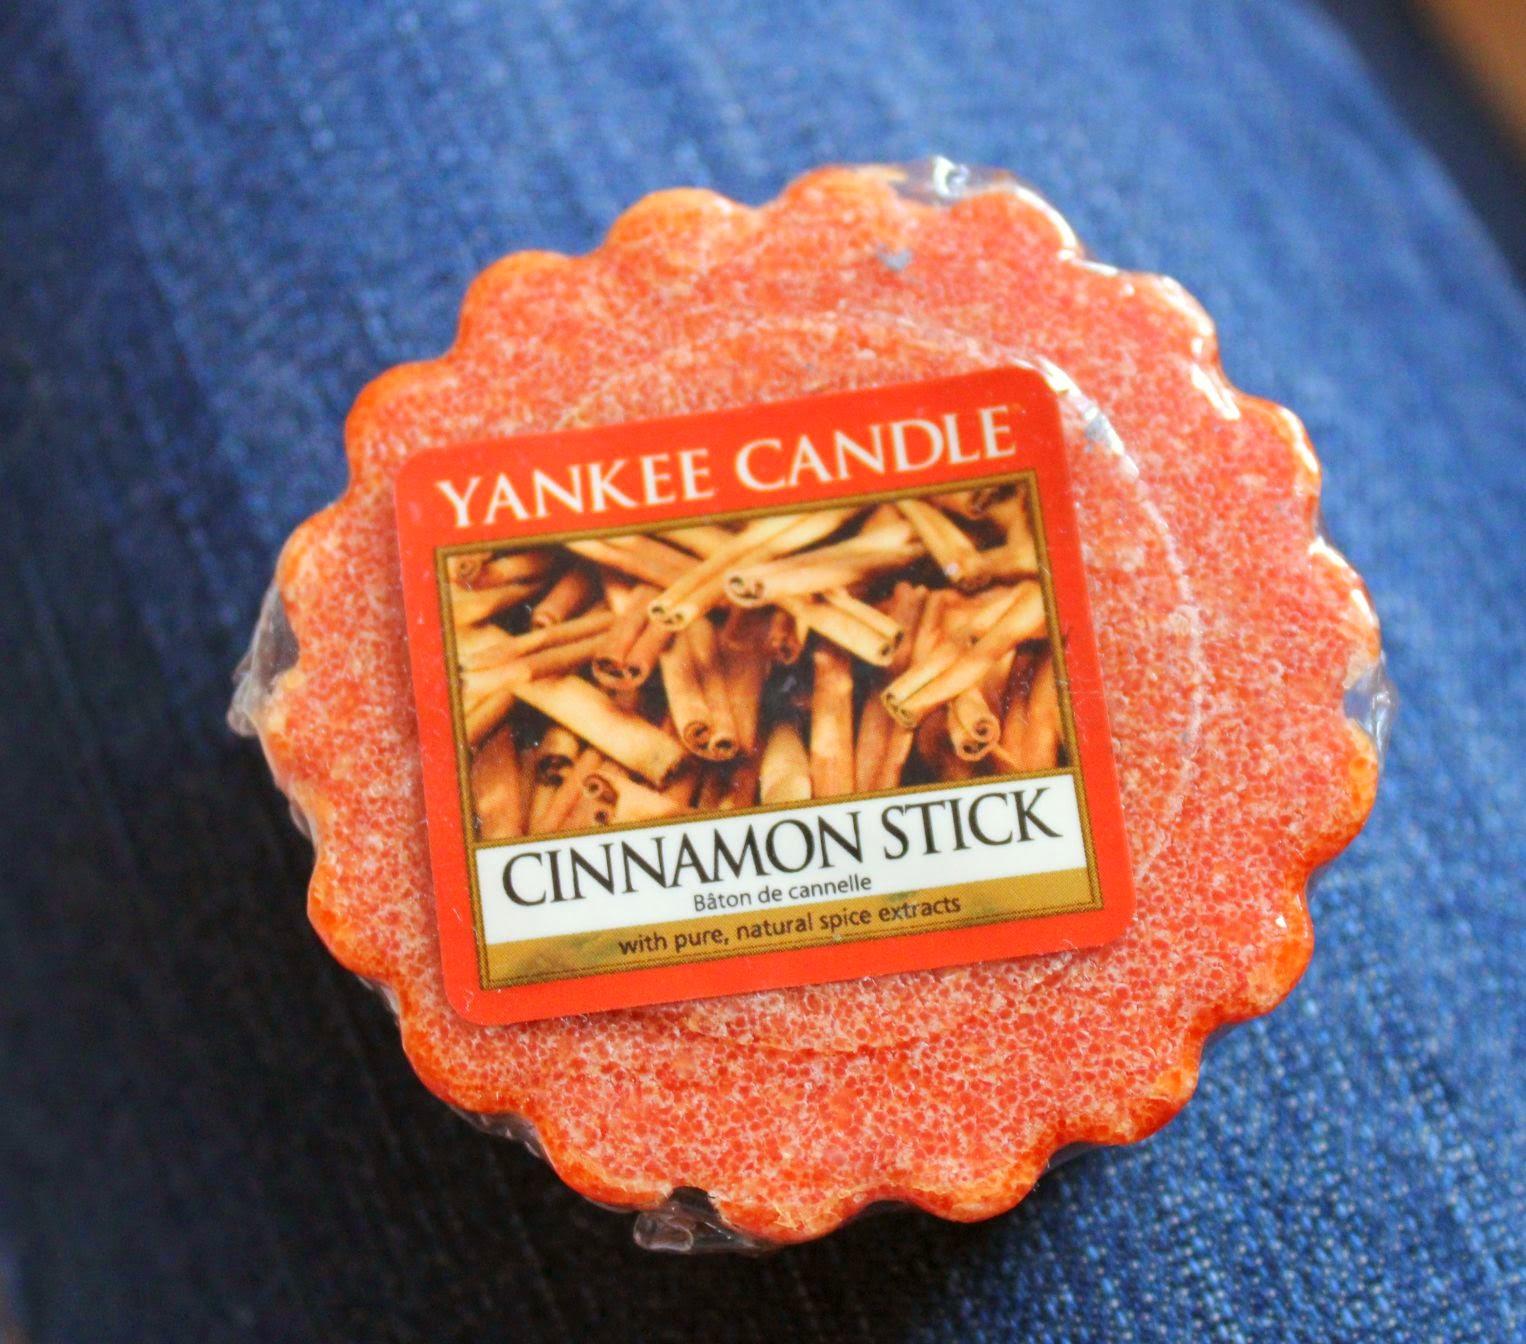 Yankee Candle *Cinnamon Stick*